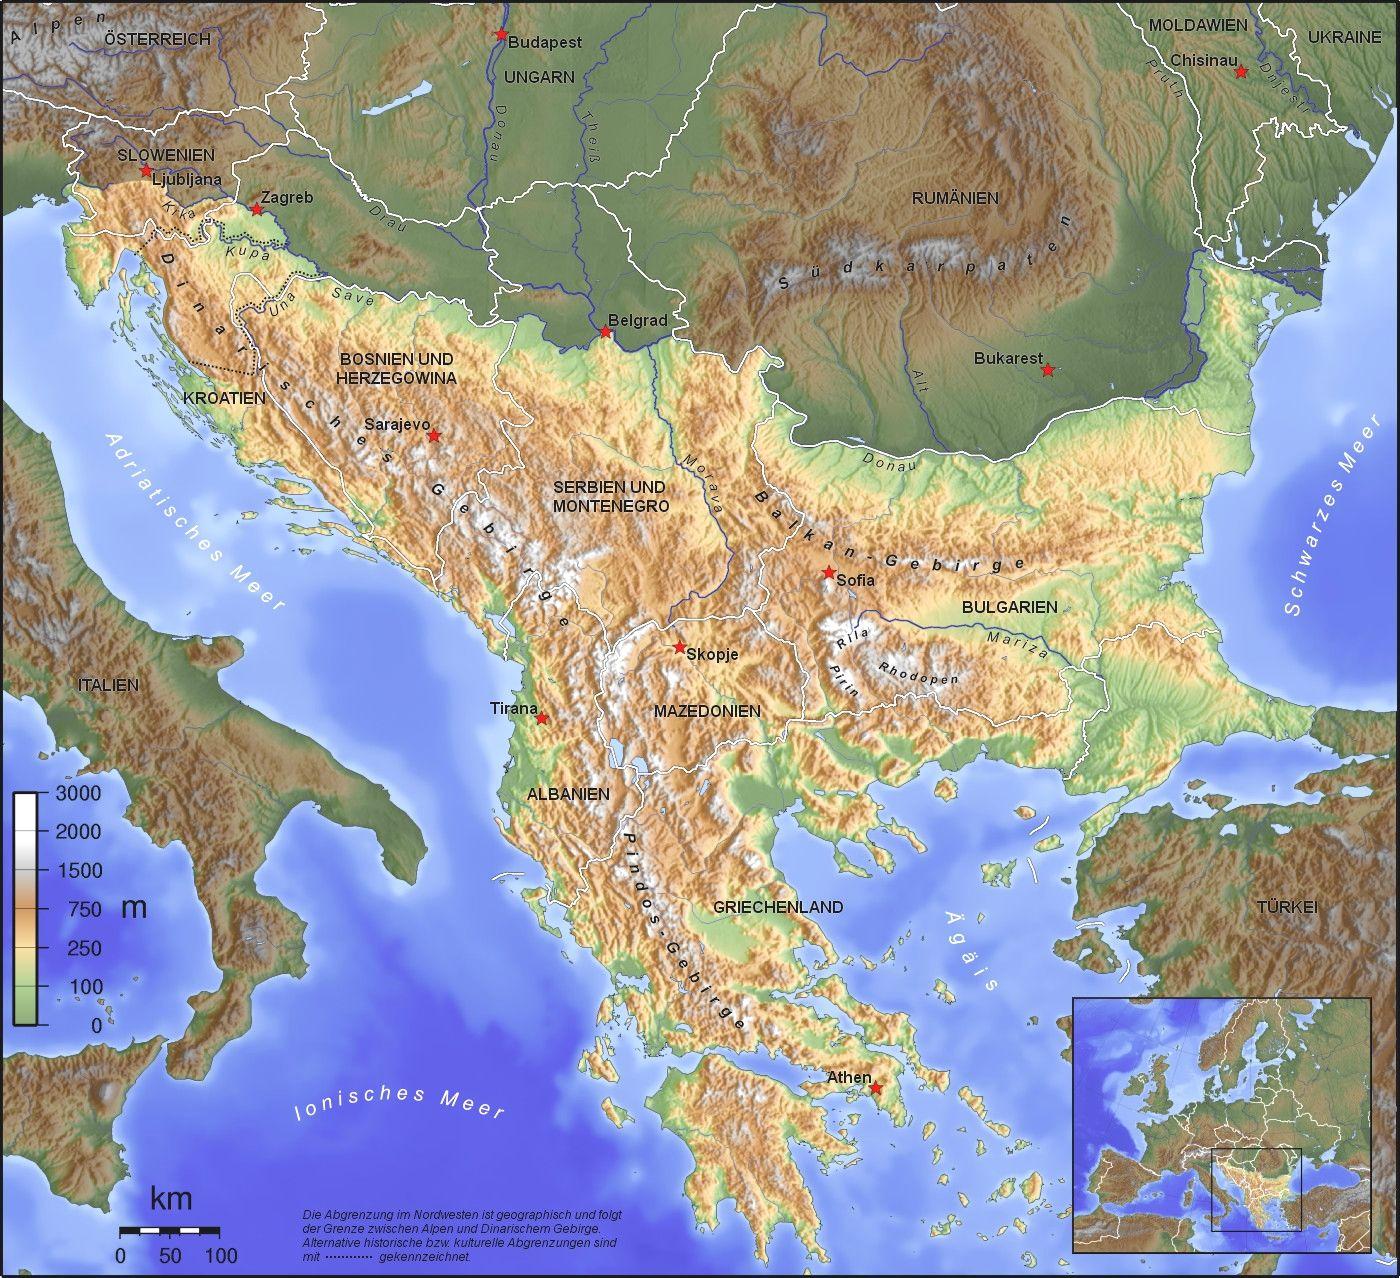 Reisen Belgien 1462 Belgiumtravel Reisenbelgien Viajesbelgica Belgium Travel Zougang Zu Eiser Site Mei Informatio Balkan Peninsula Montenegro Map Balkan